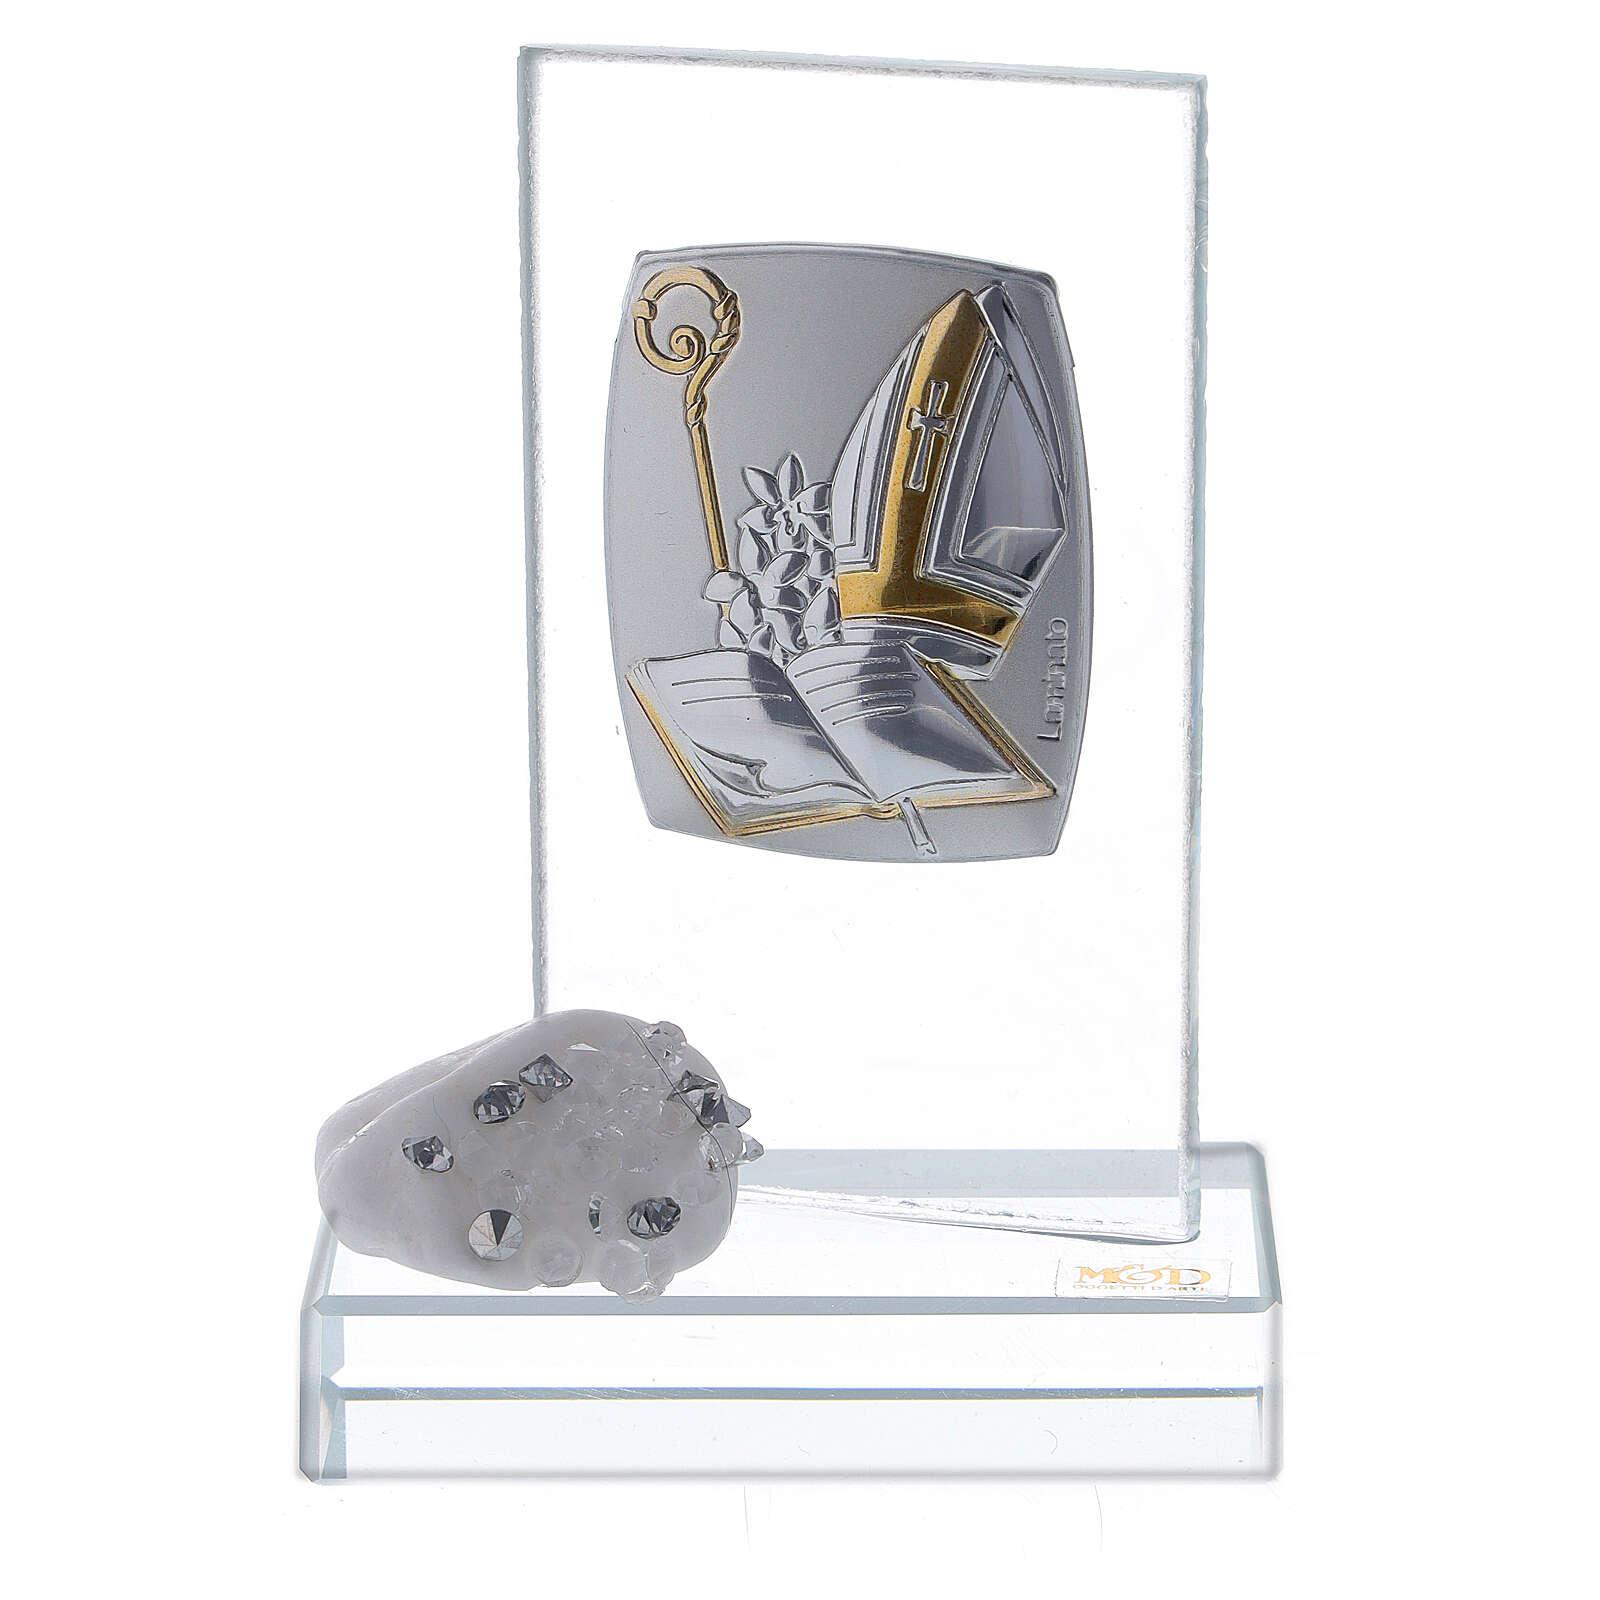 Favor Confirmation symbols made of glass 3